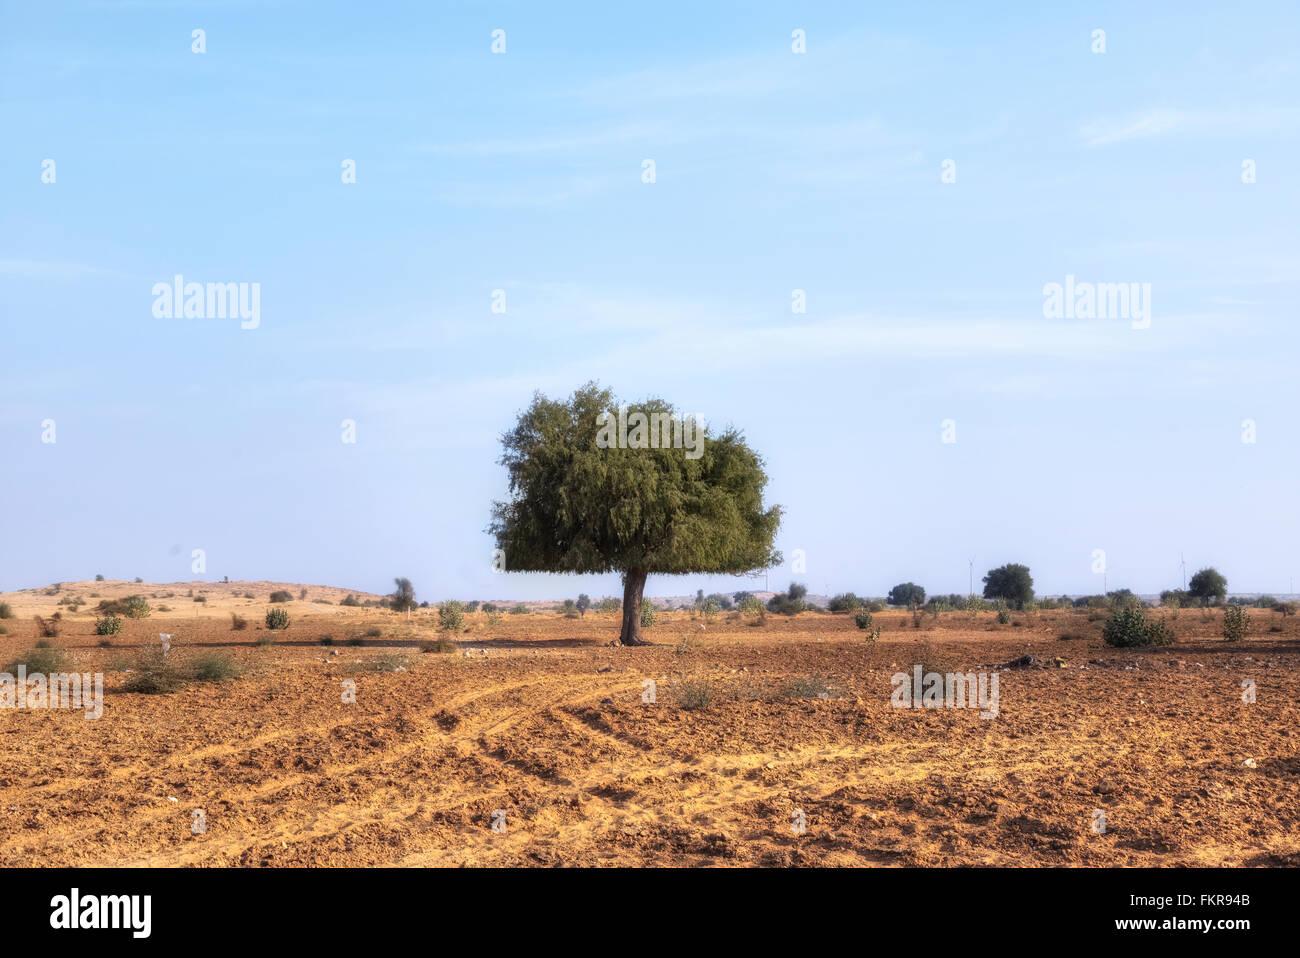 Acacia nel deserto di Thar, Rajasthan, India Immagini Stock